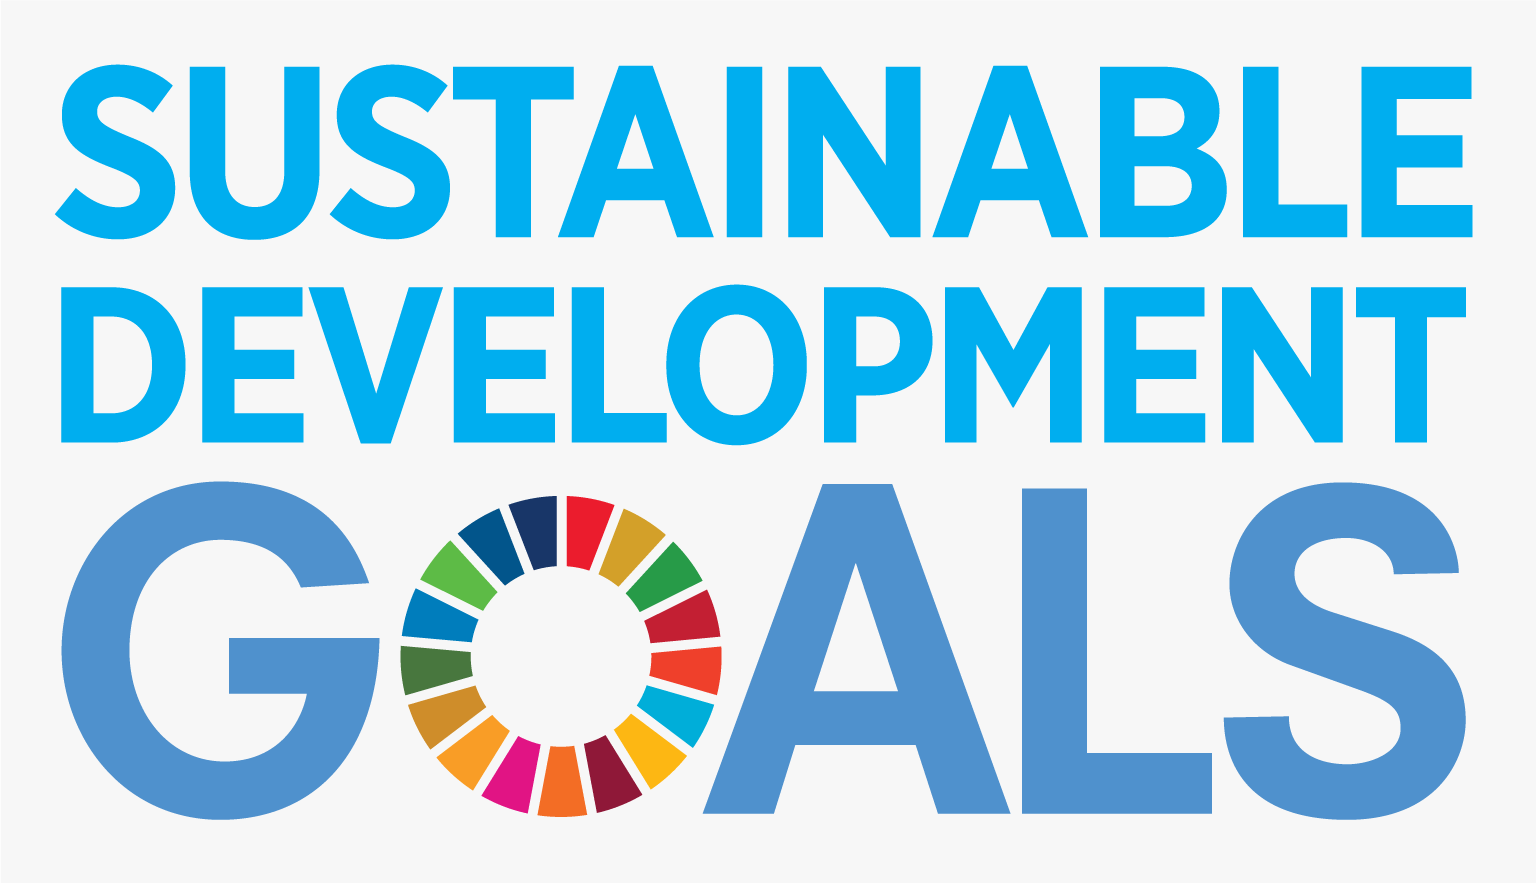 SDGsの17の目標と169のターゲット一覧とは?SDGsバッジの入手方法も